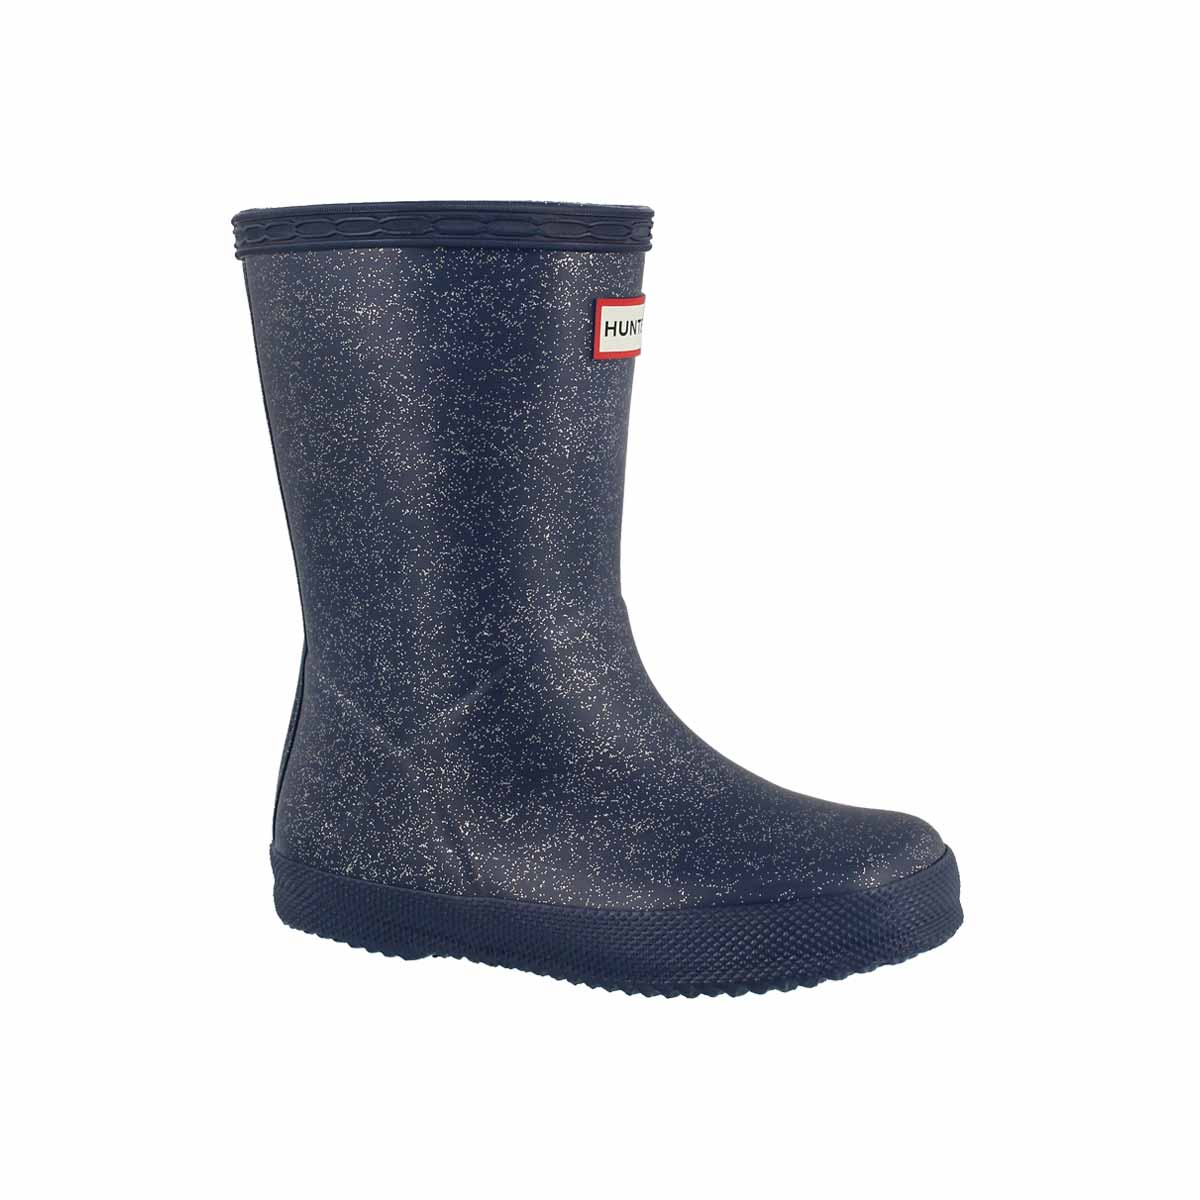 Infants' FIRST GLITTER dark blue rain boots